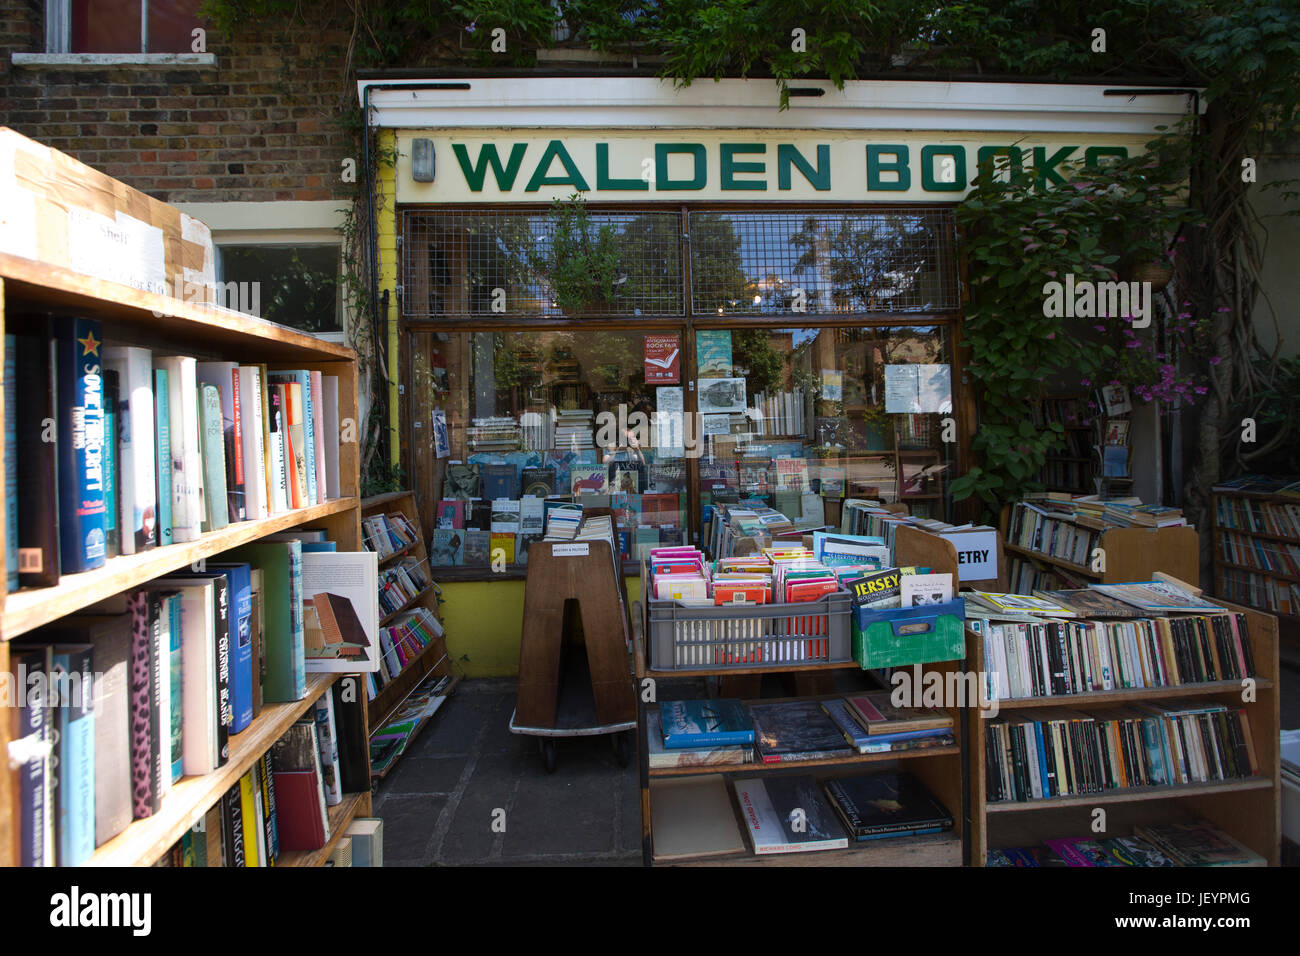 Walden Books, second hand bookshop on a quiet residential Camden backstreet, Harmood Street, Camden, London, UK - Stock Image